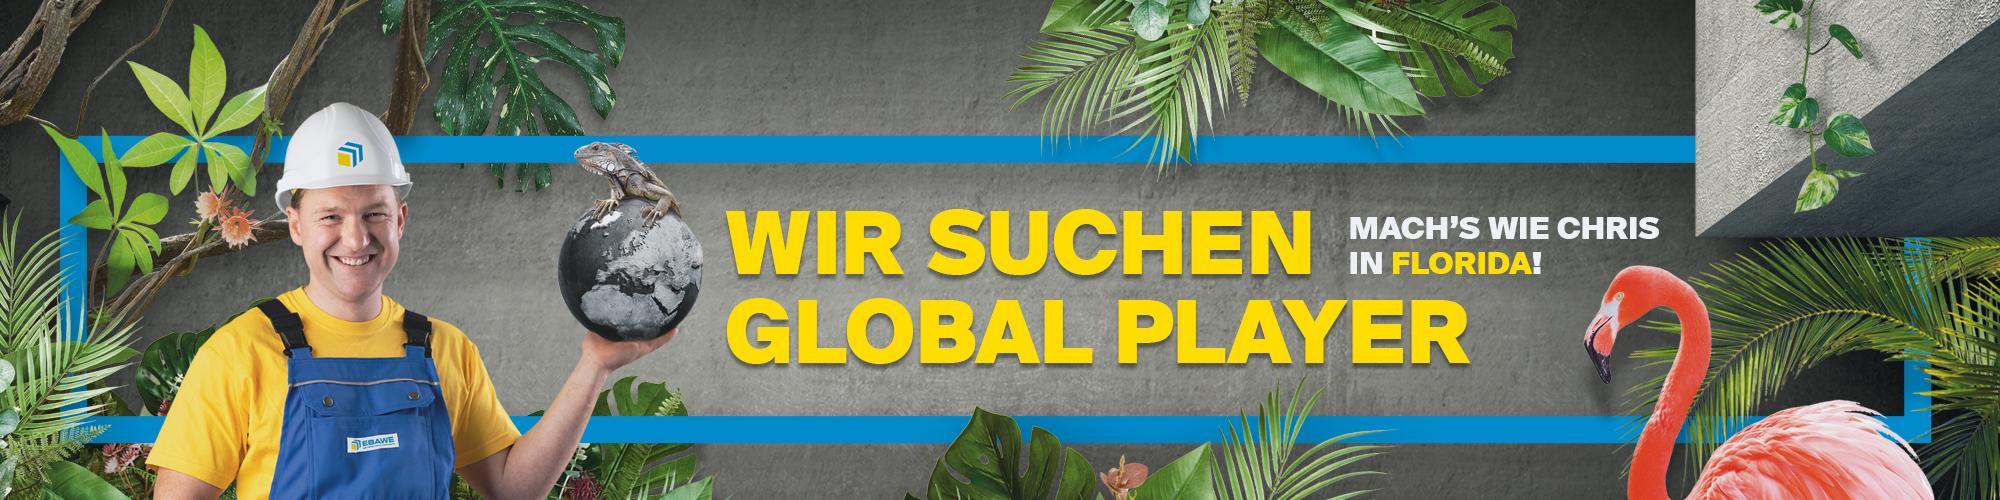 EBAWE Anlagentechnik GmbH